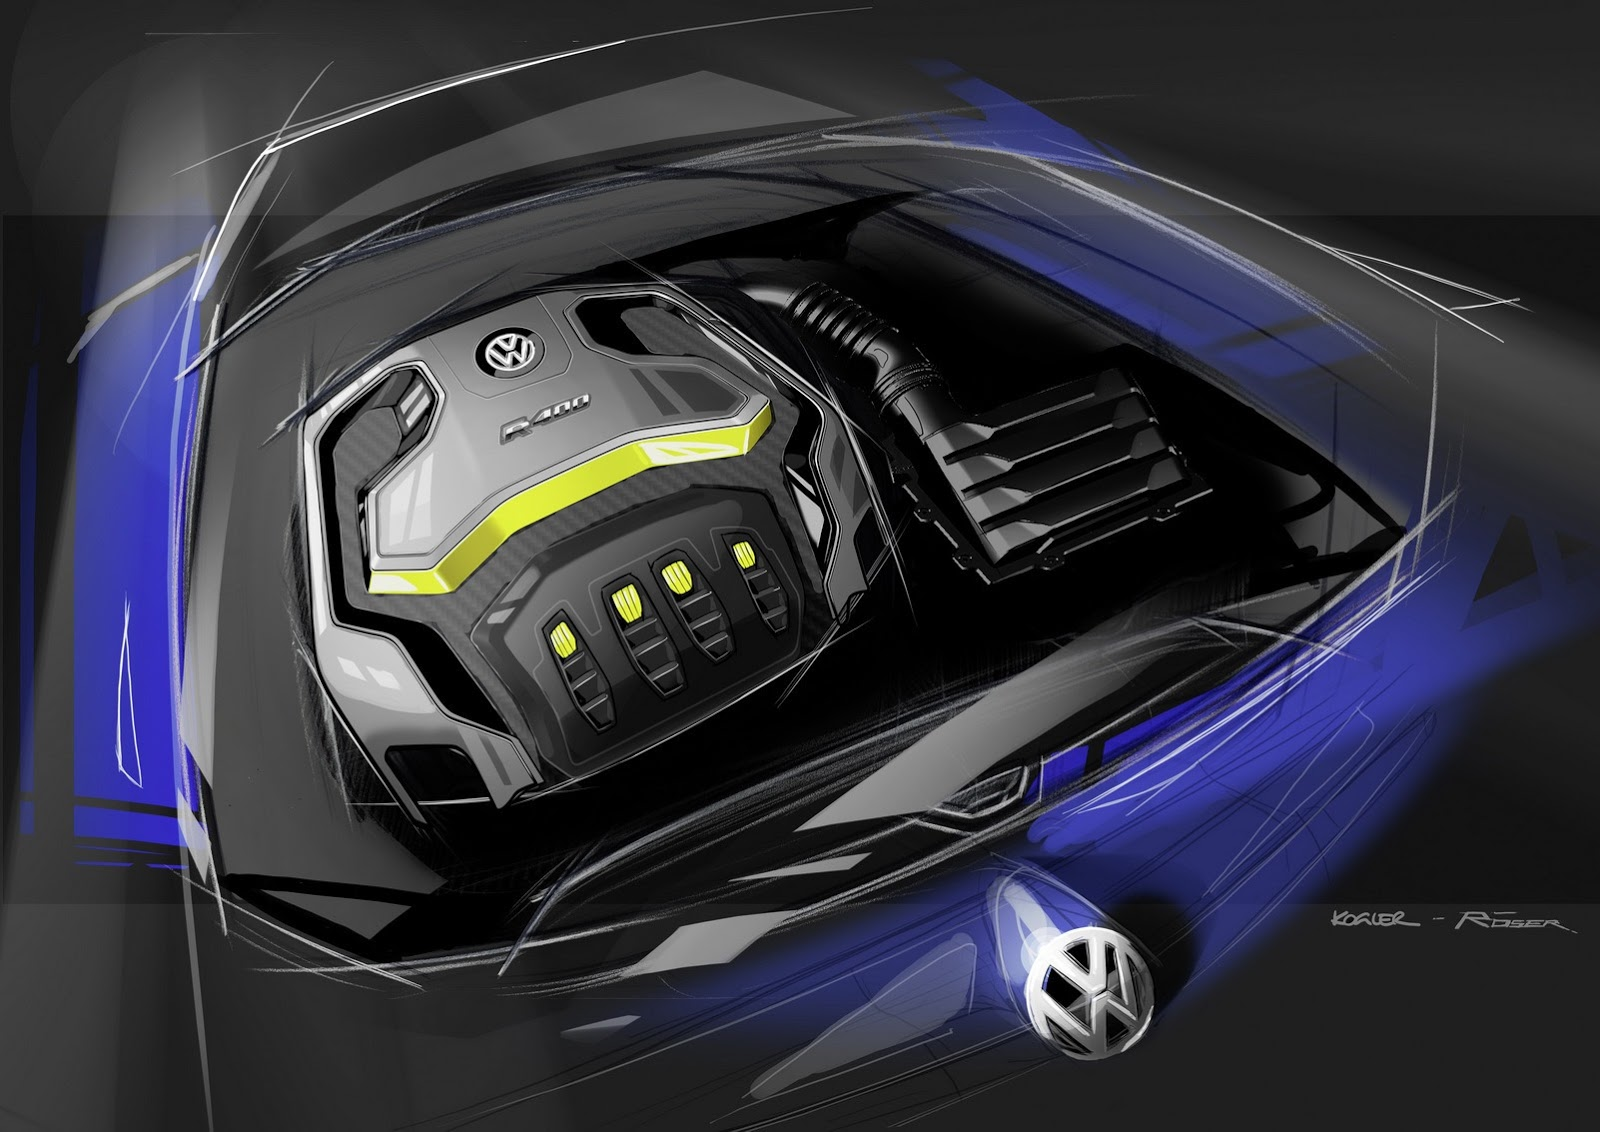 volkswagen golf r 400 concept previewed before beijing gtspirit. Black Bedroom Furniture Sets. Home Design Ideas